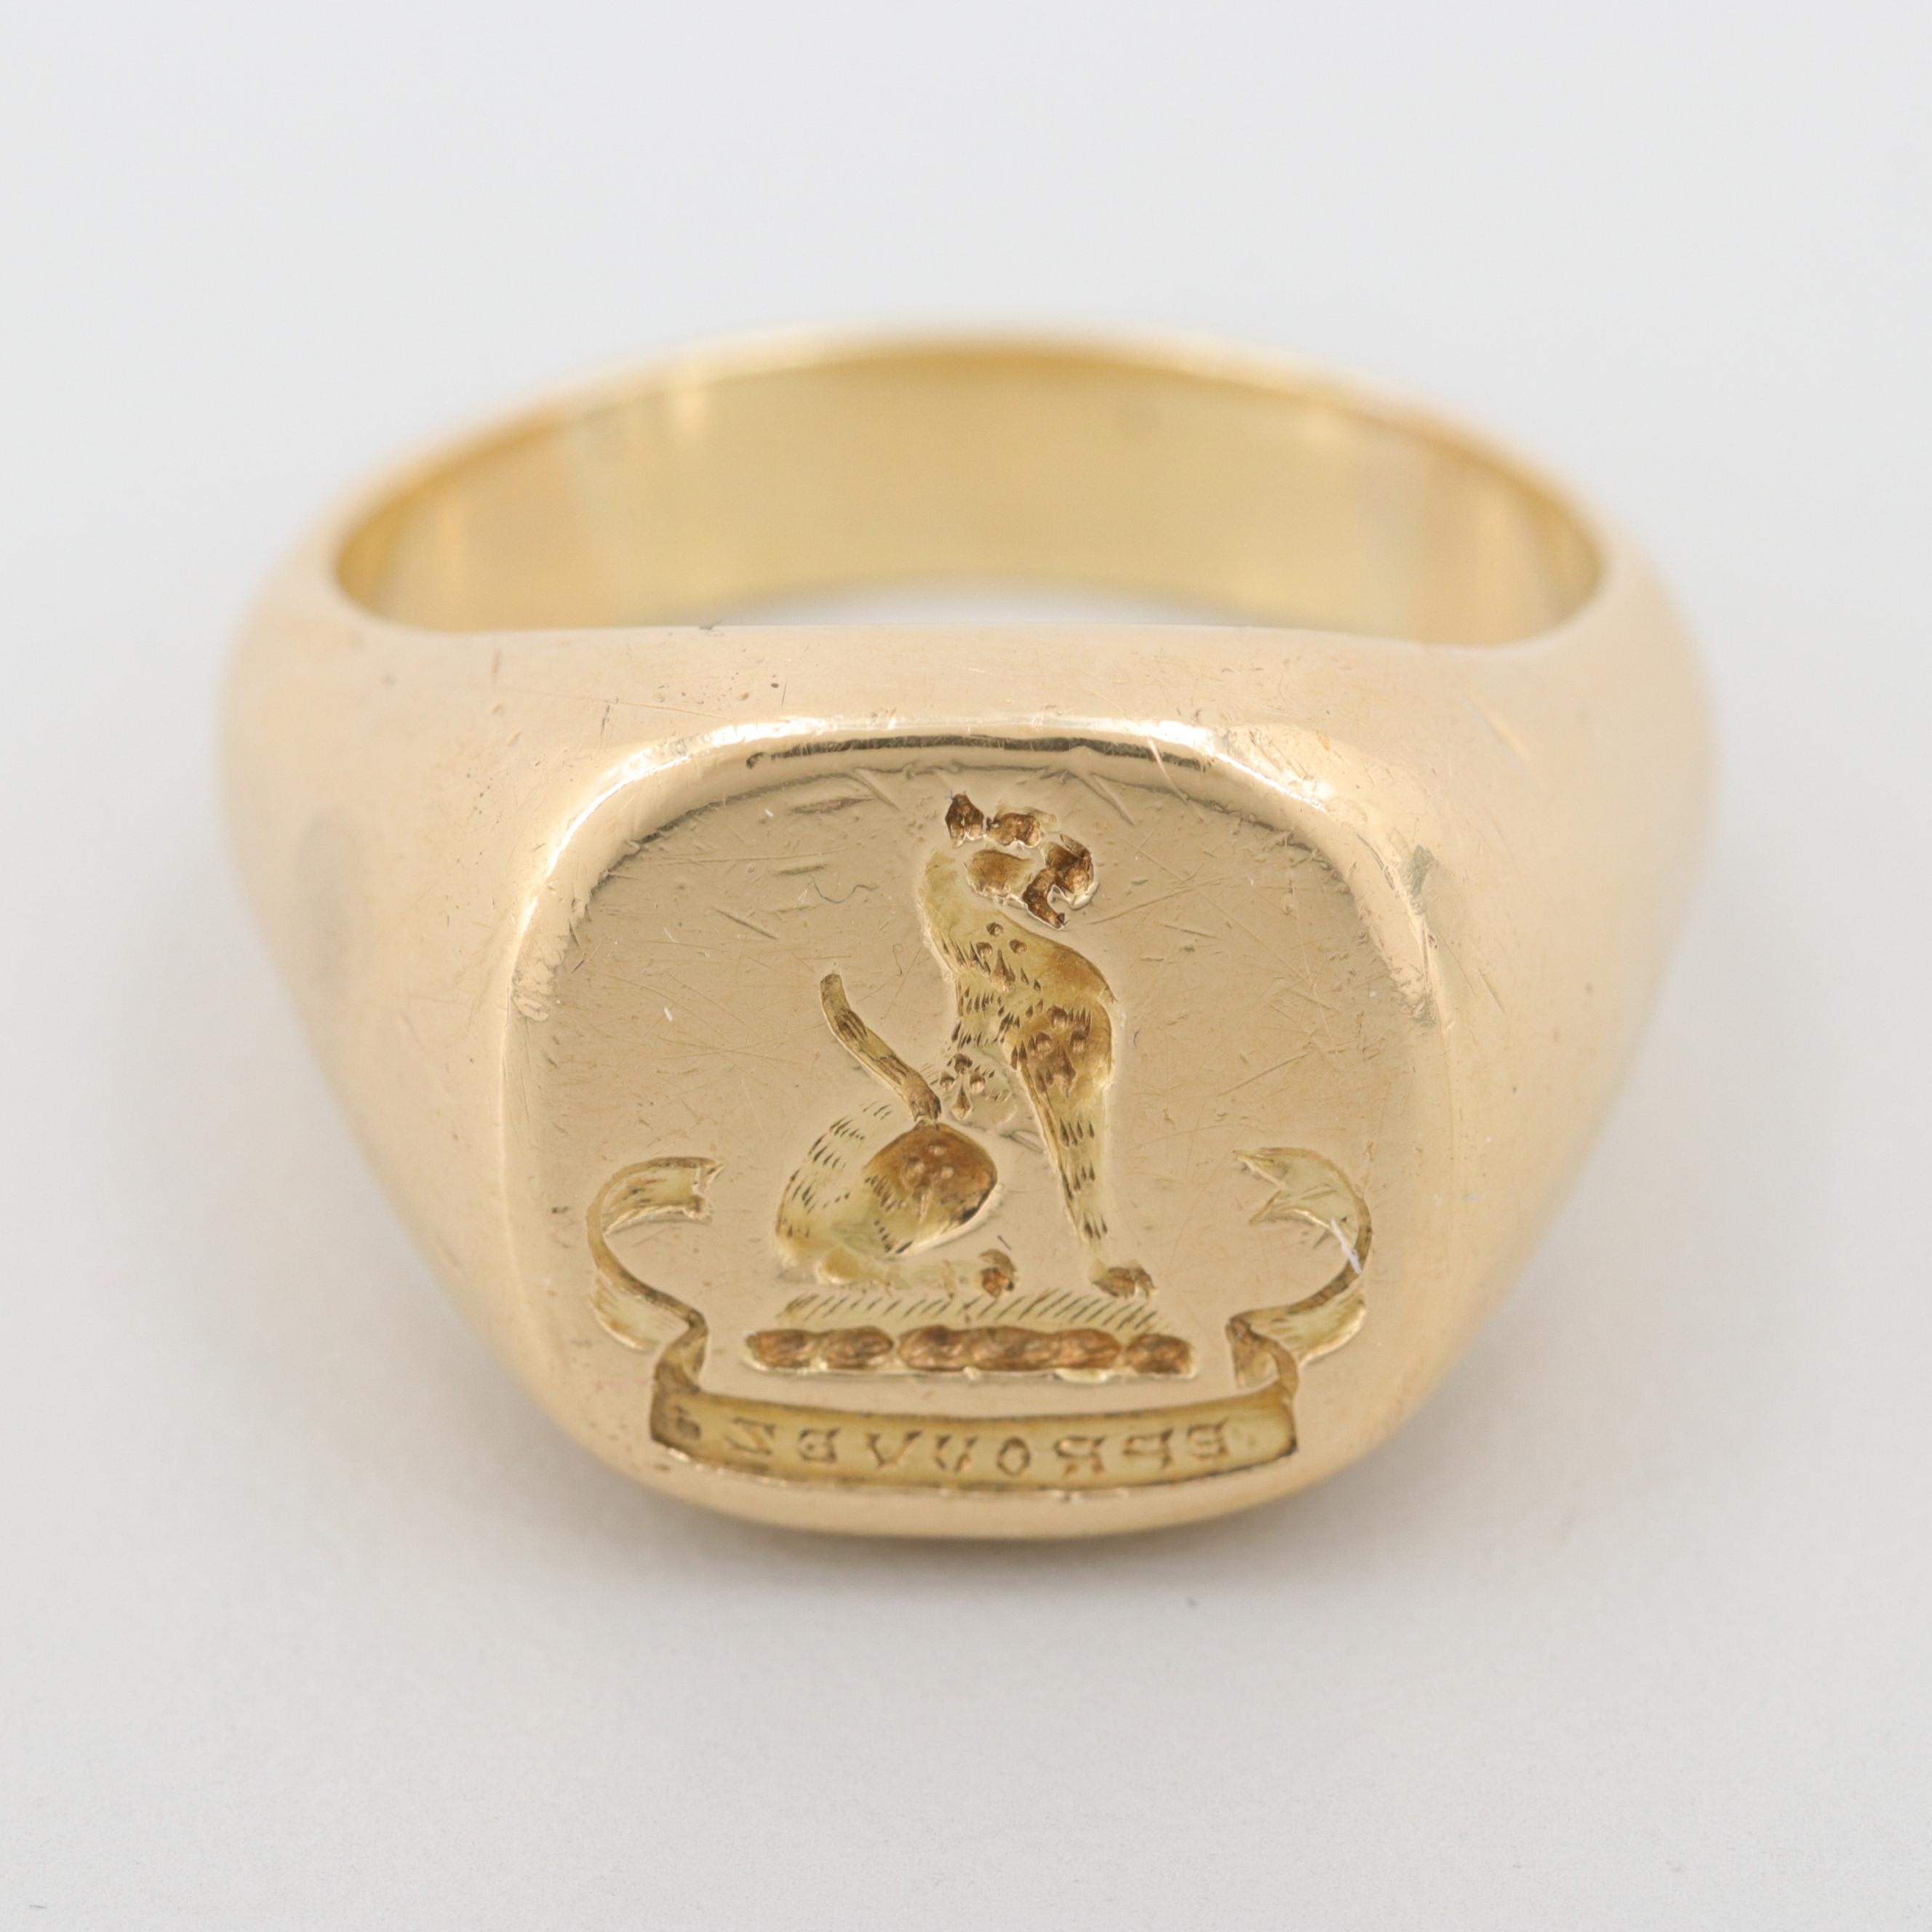 Circa 1983 Sheffield England 18K Yellow Gold Signet Ring